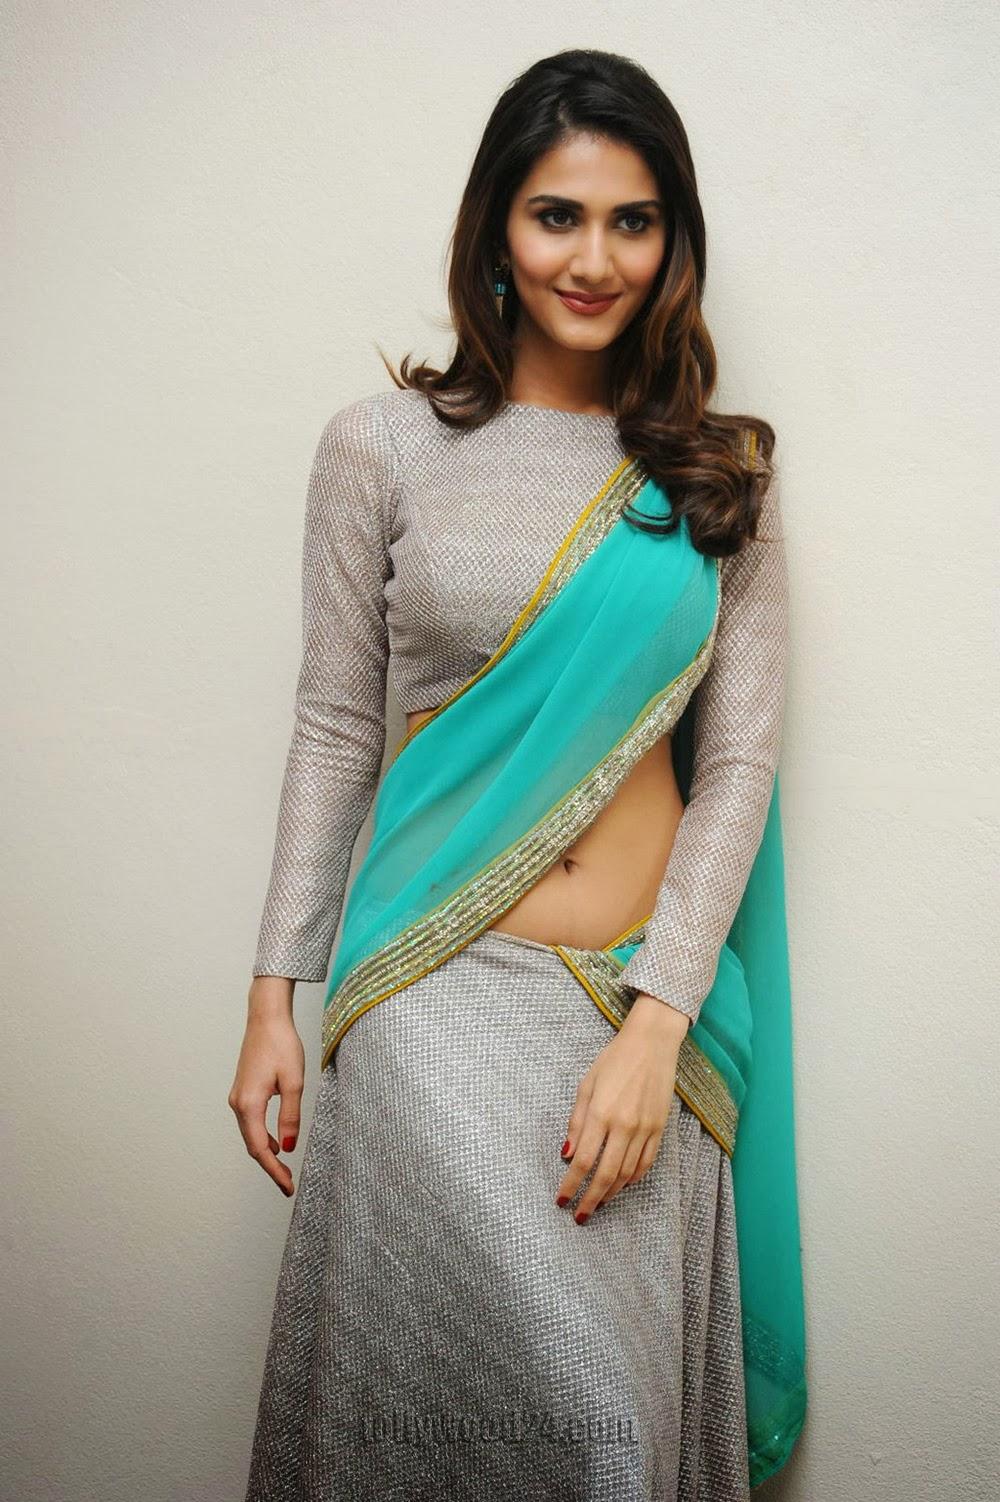 Hot And Sexy Vidya Balan Images